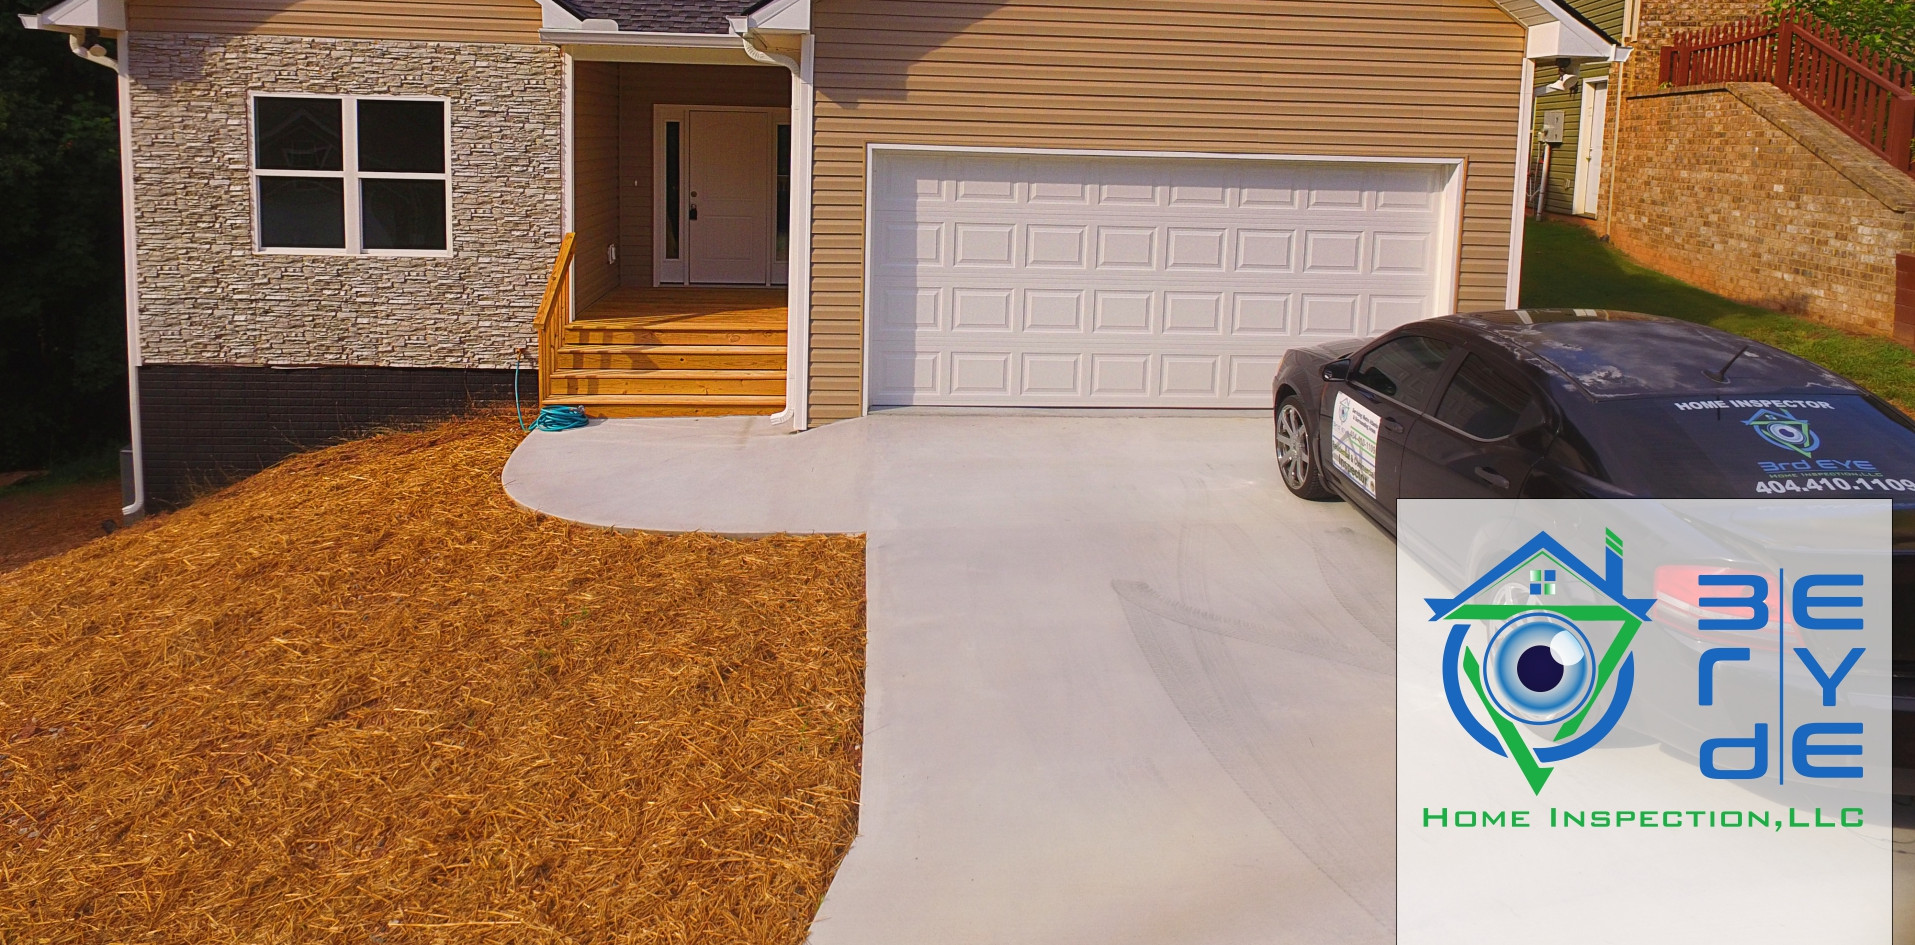 108 Beacon Ct _ 3rd EYE Home Inspection-